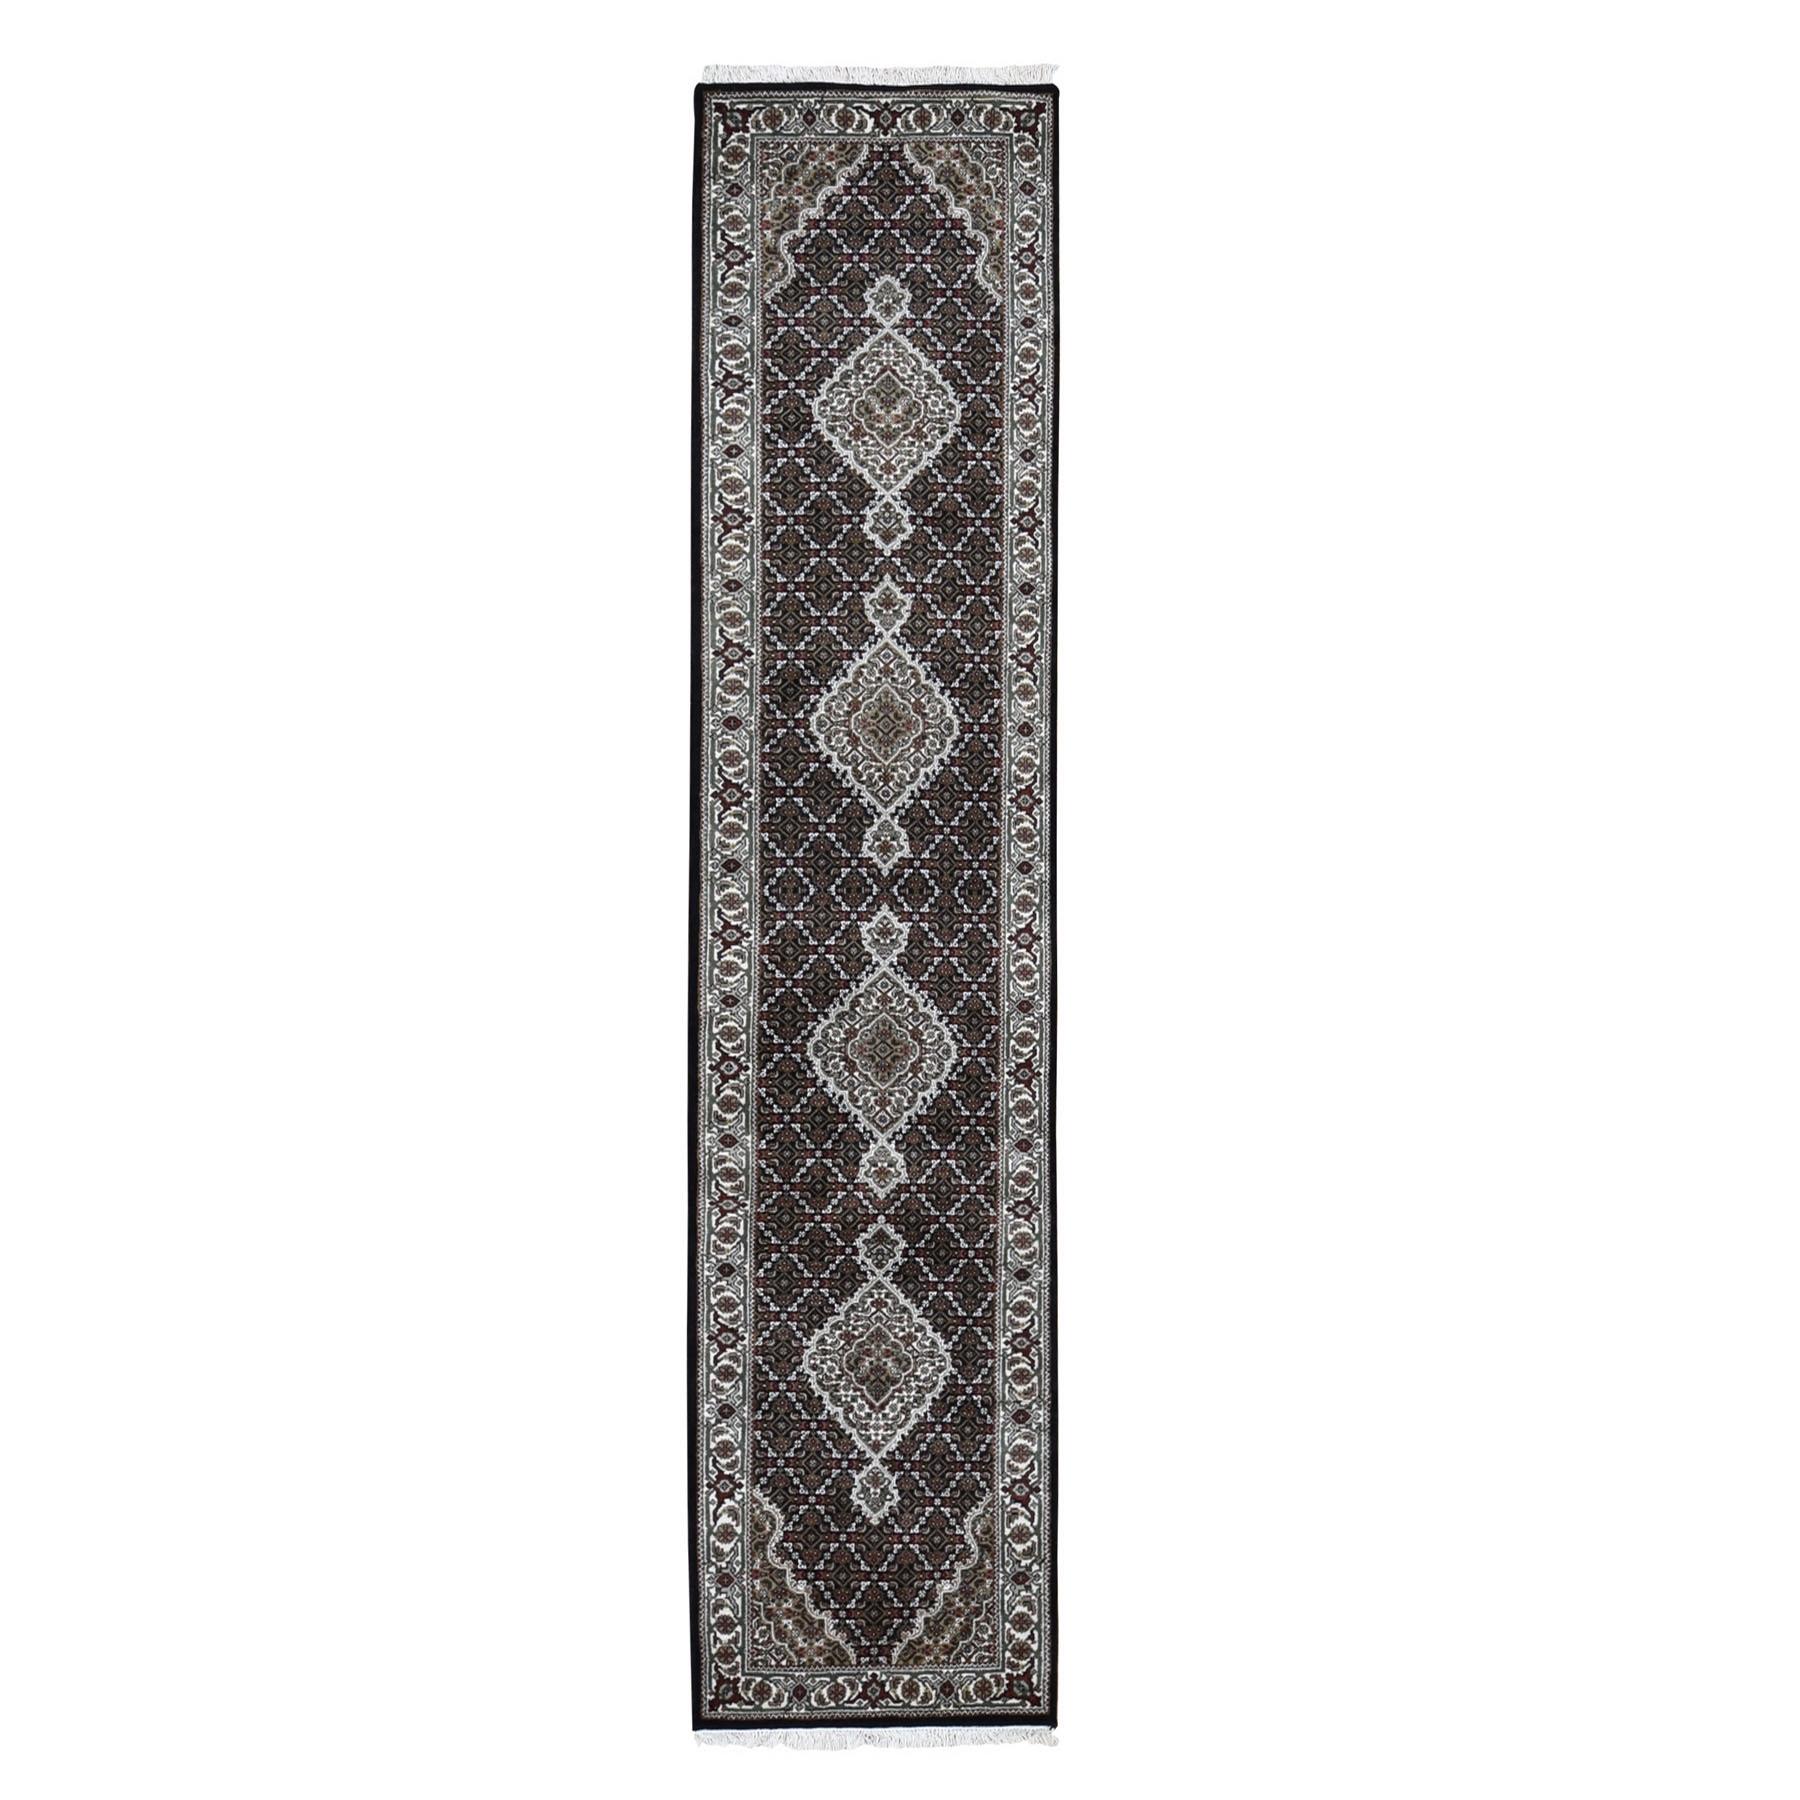 "2'7""x10' Black Tabriz Mahi Wool and Silk Runner Hand Knotted Oriental Rug 49551"